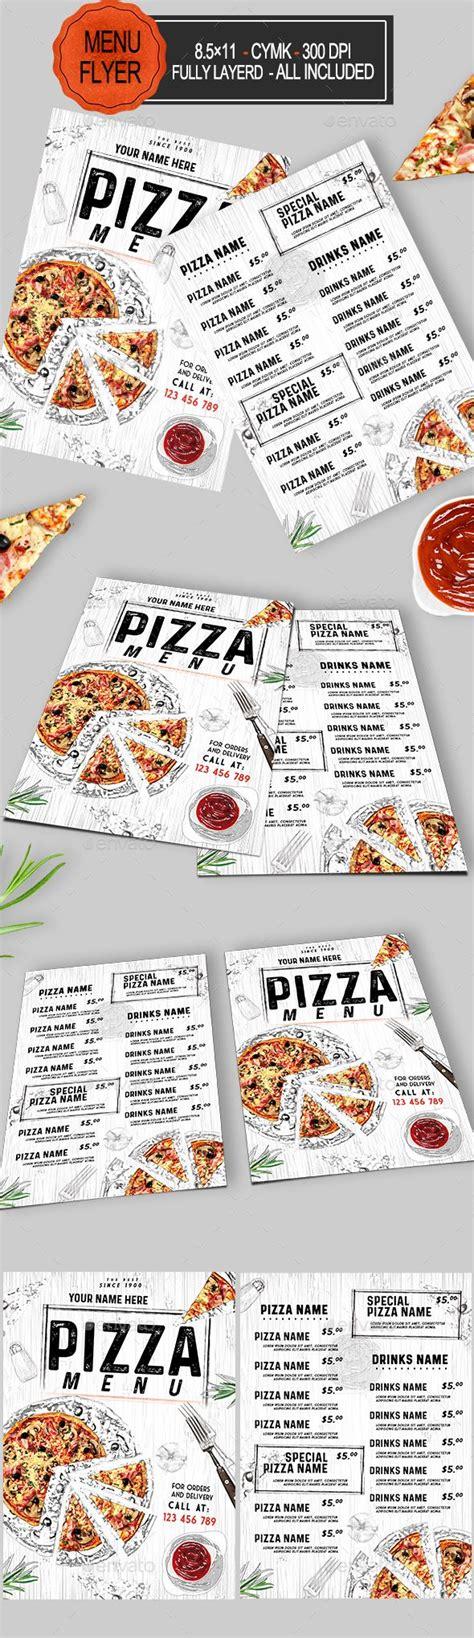 25 best ideas about pizza menu design on pinterest